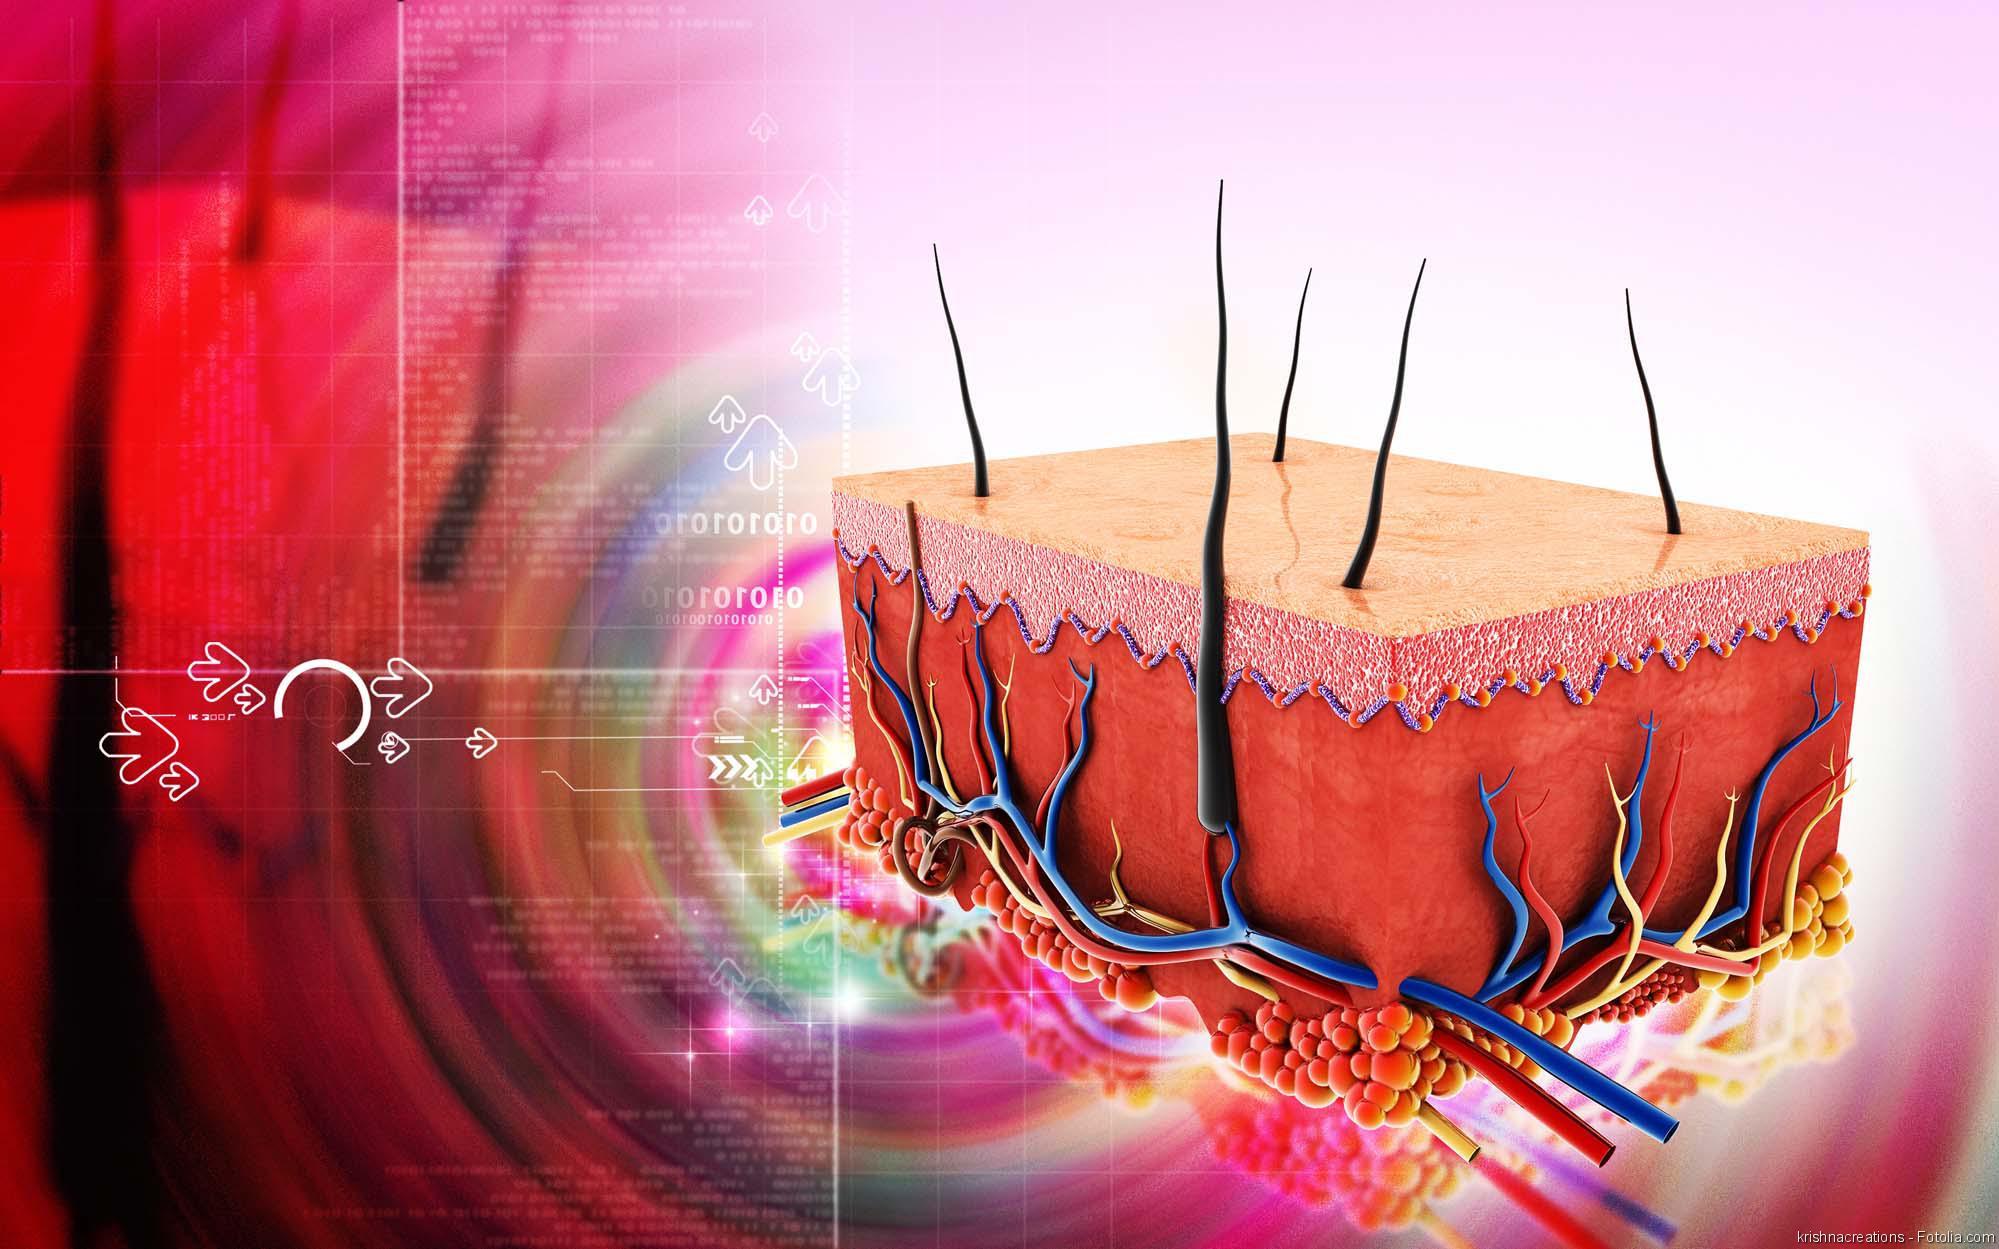 Erhöhter östrogenspiegel